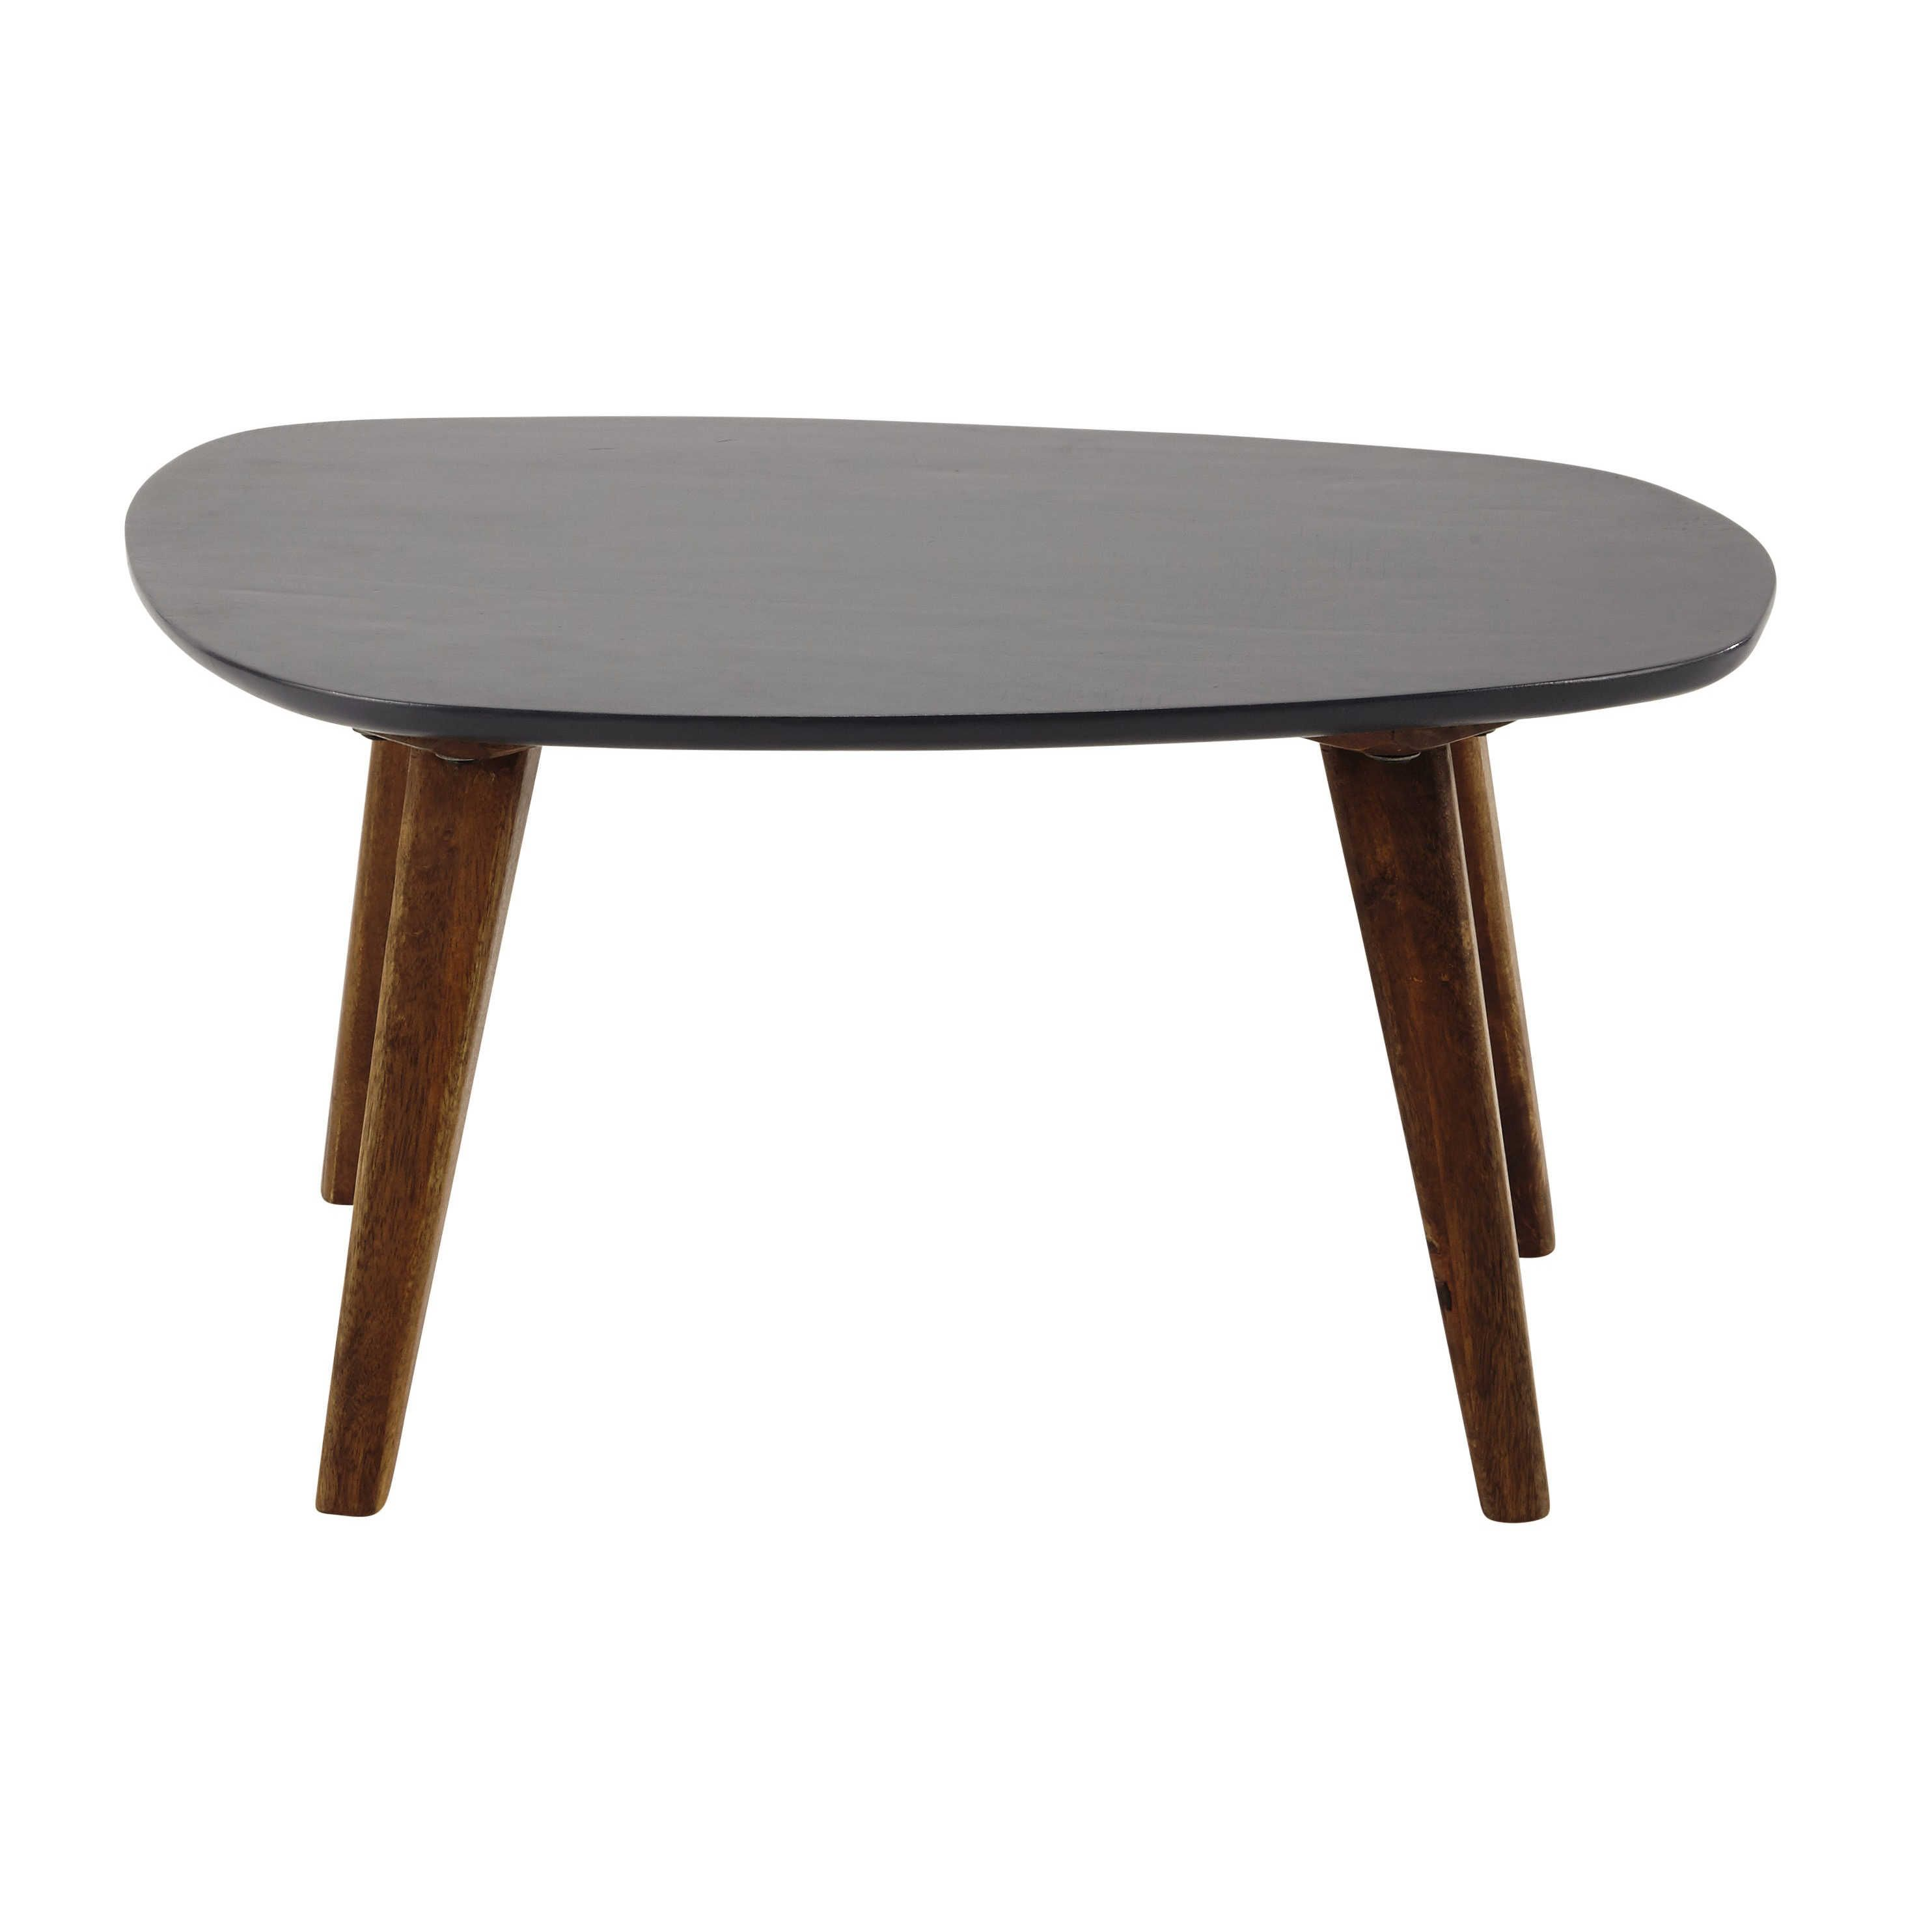 cm en 70 bois basse grise Janeirotable vintage Table L PiXulwOZkT